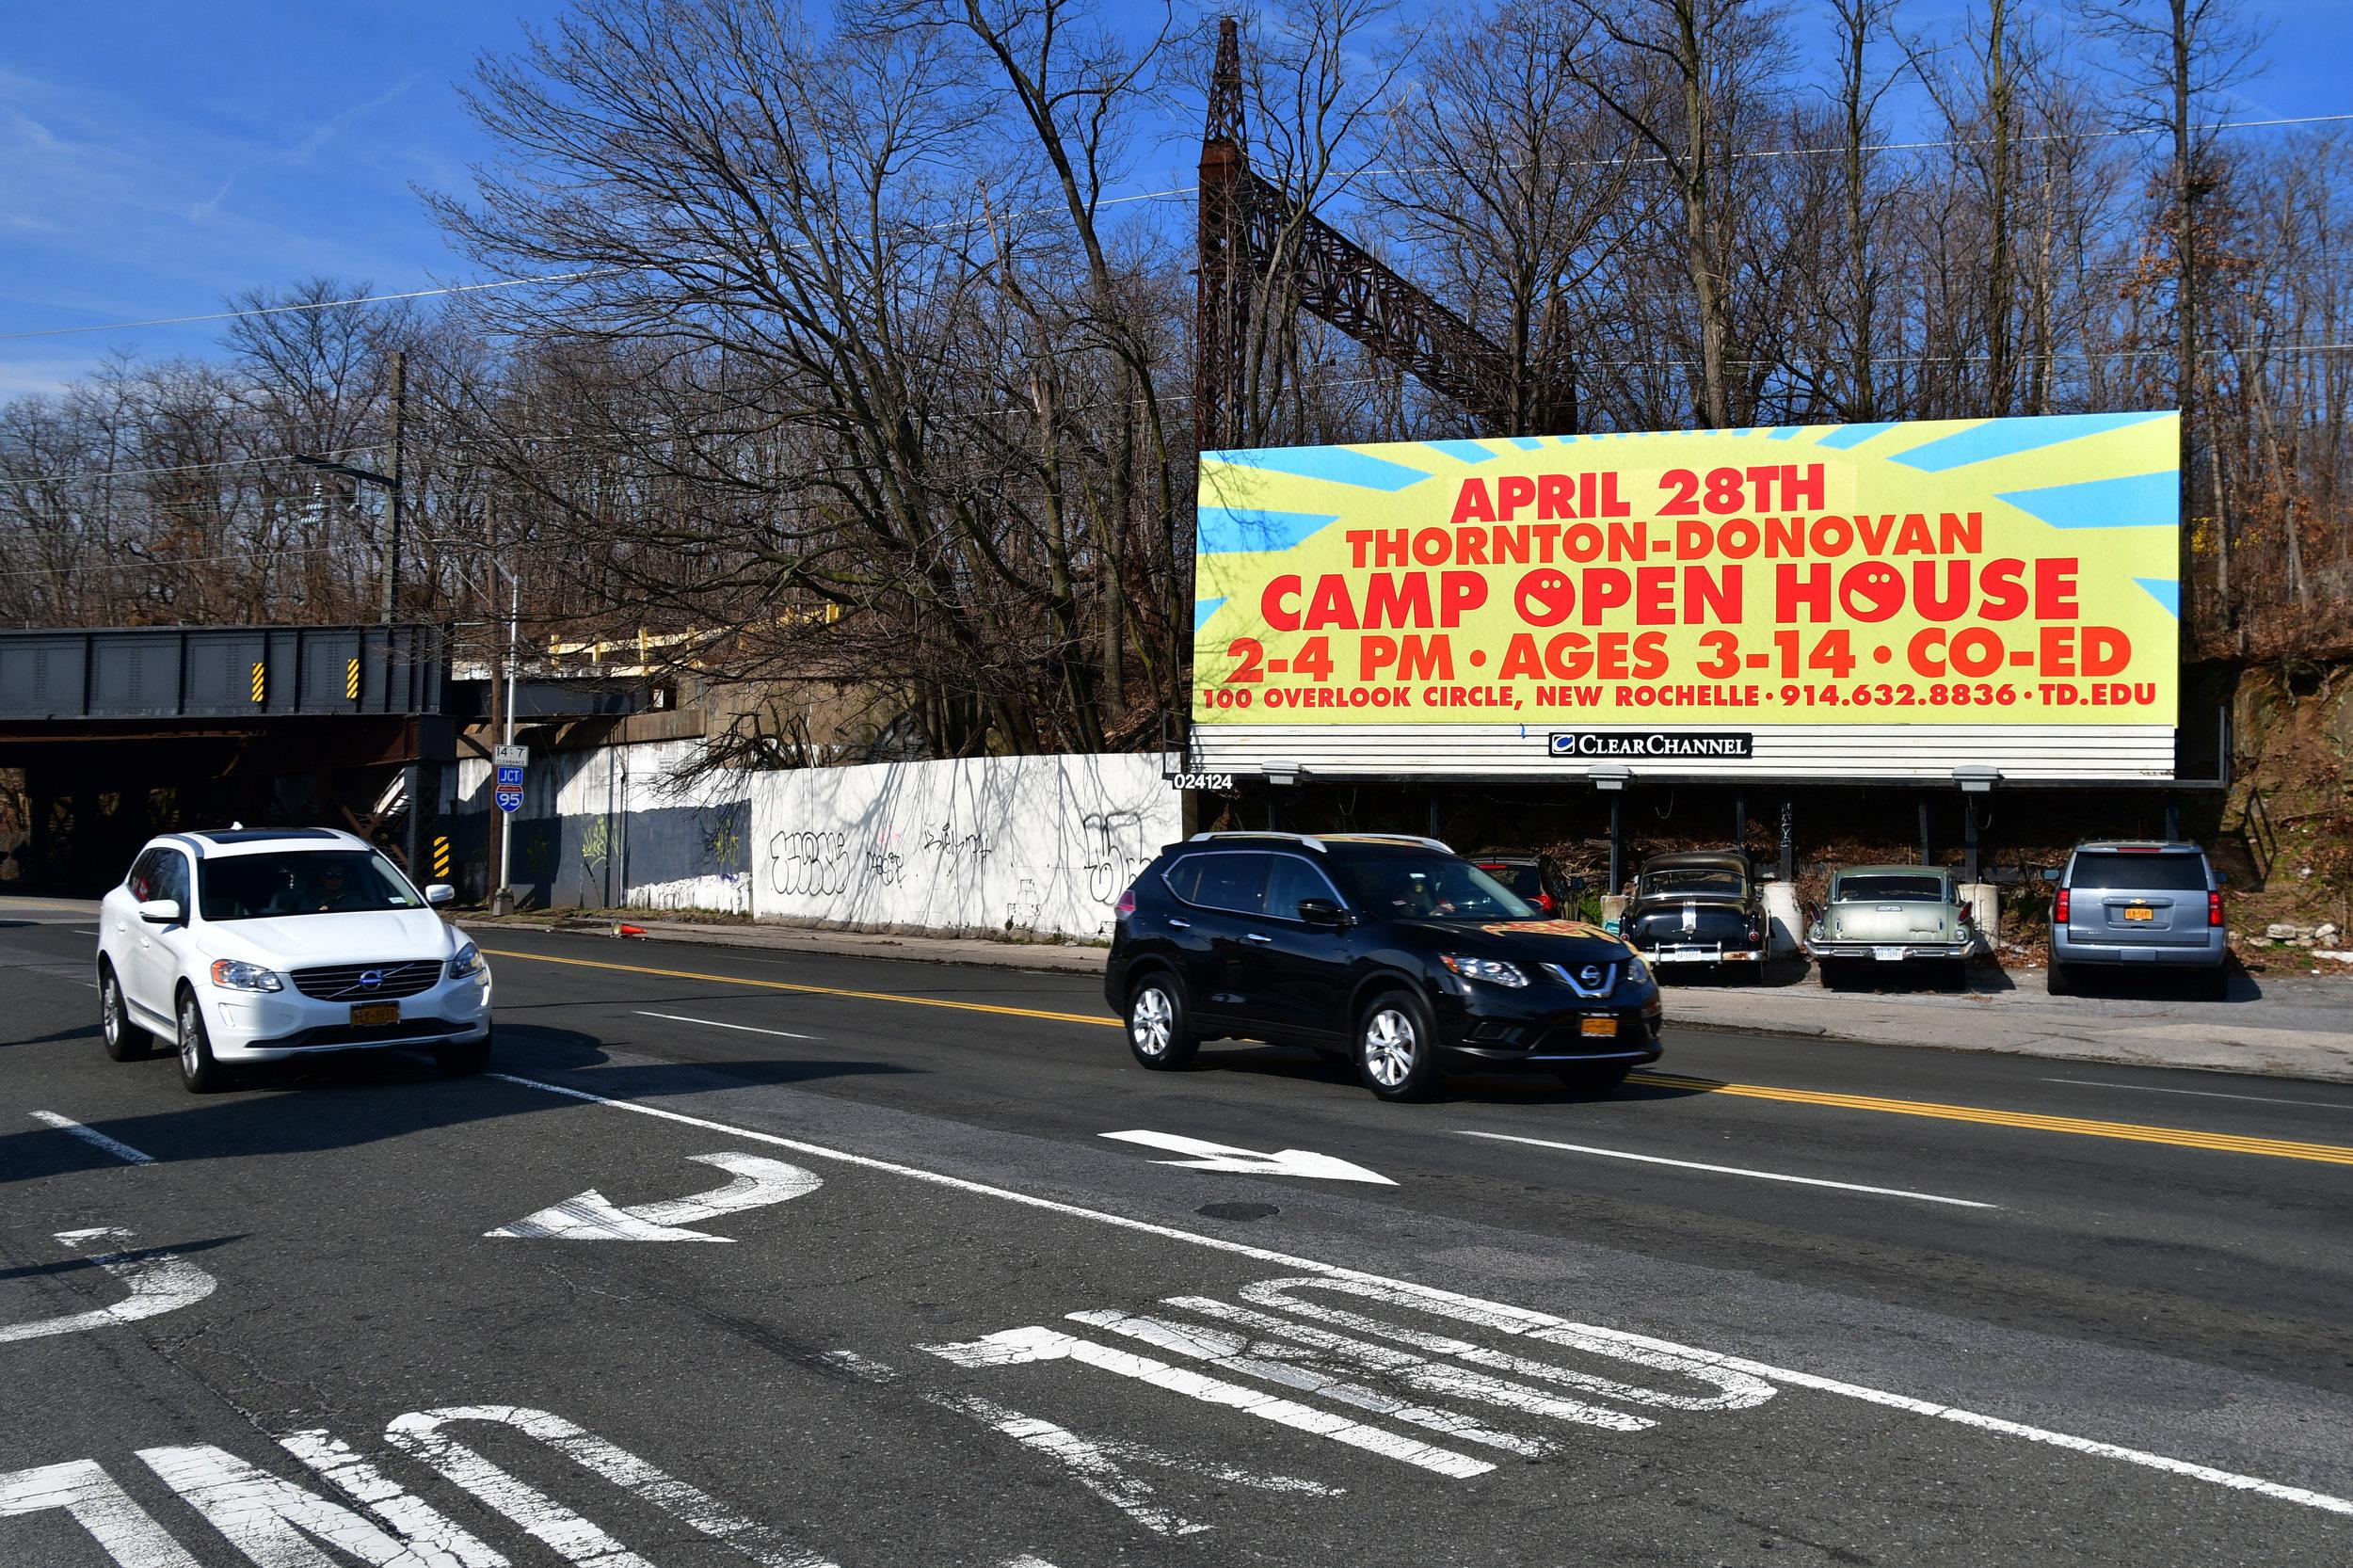 NYC-024124-B_Campaign_ThorntonDonovanSchool_2019-03-26_105223970.jpg